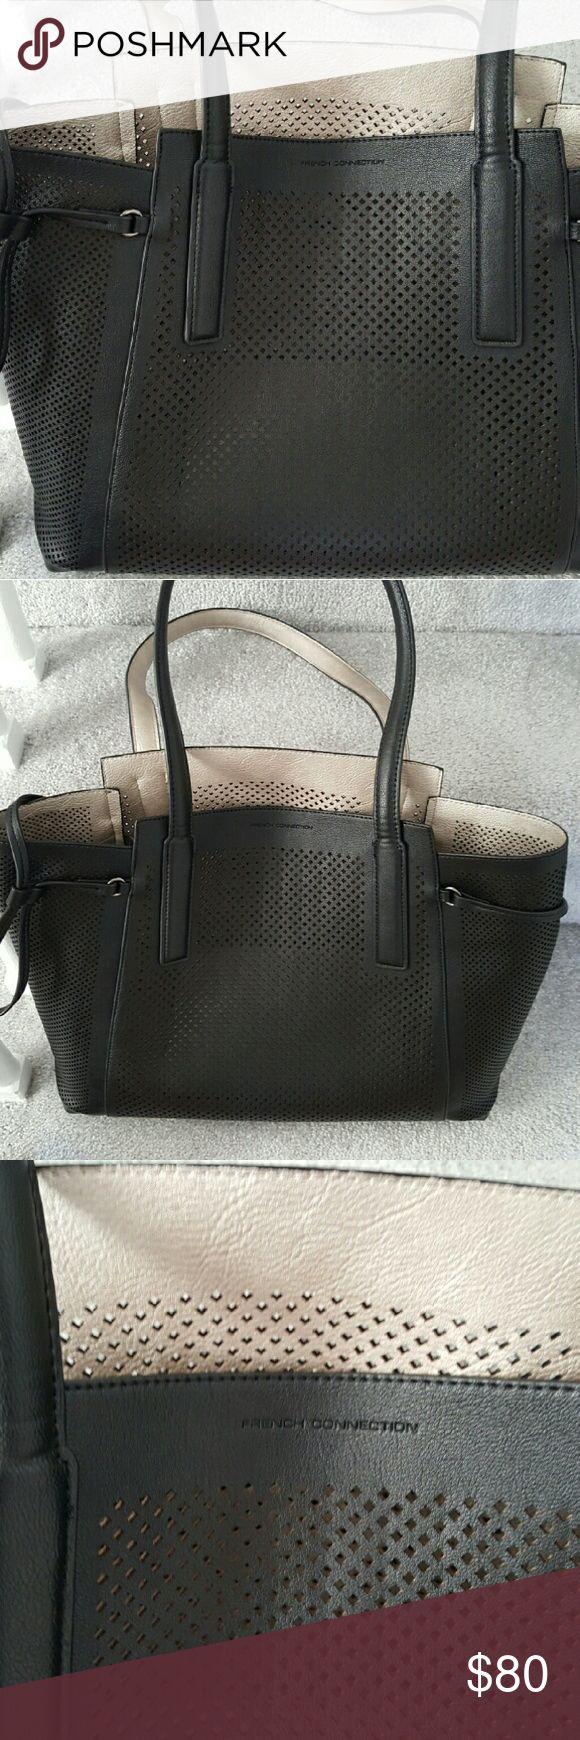 Selling this French Connection tote on Poshmark! My username is: deemattie. #shopmycloset #poshmark #fashion #shopping #style #forsale #French Connection #Handbags